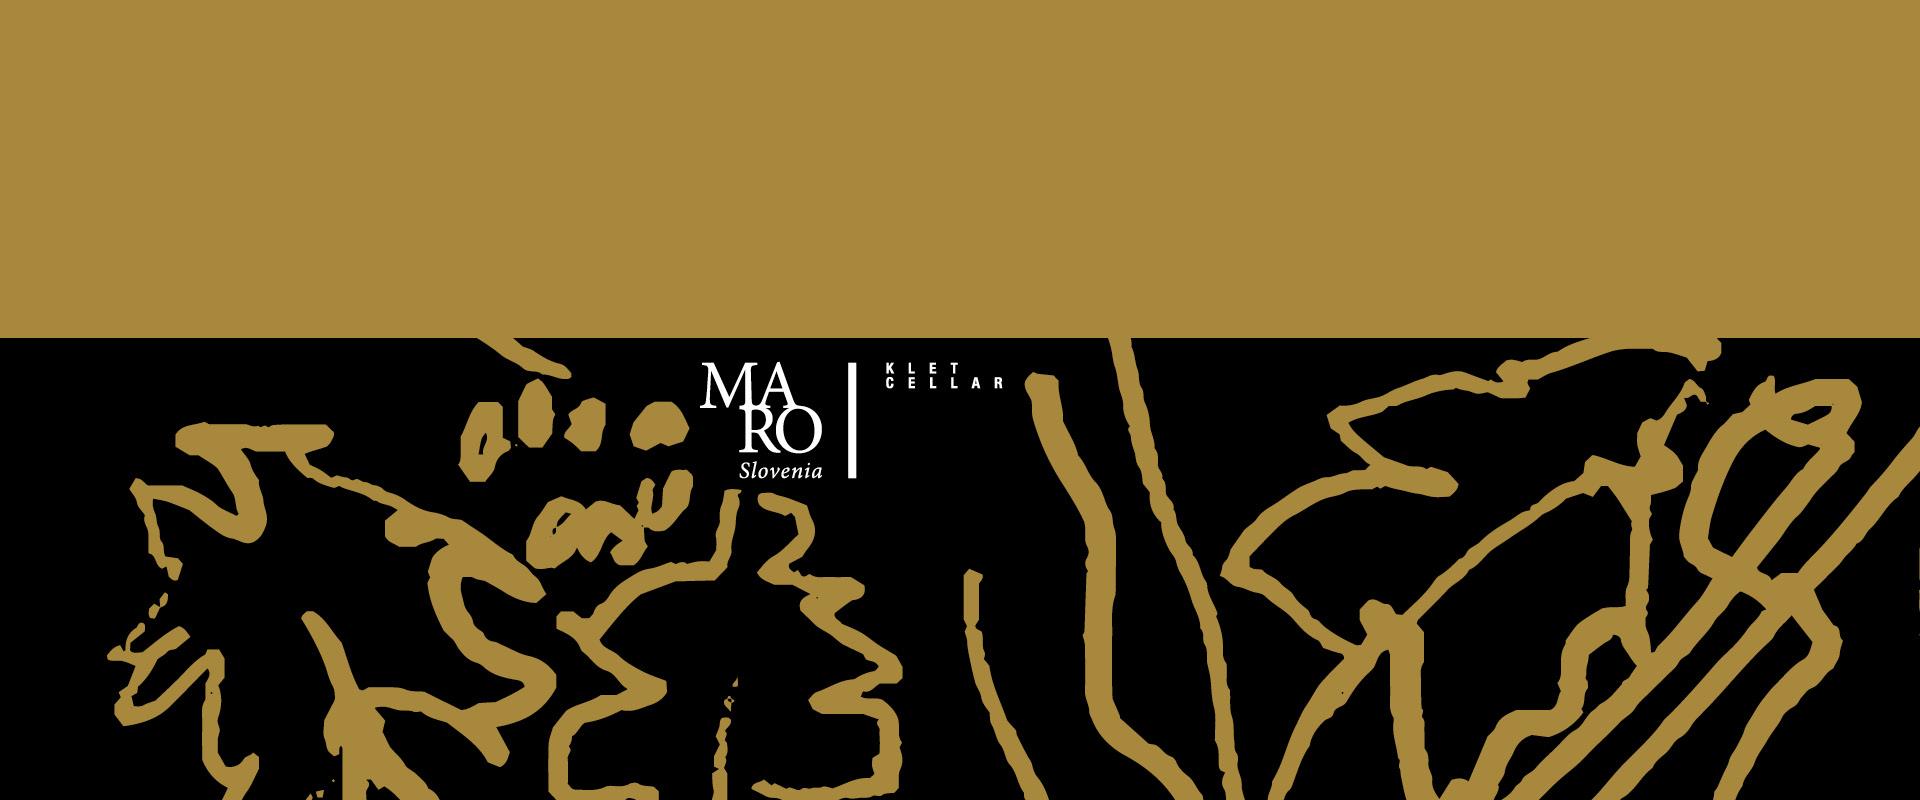 glava_grafika_mursa_ozmec_studio_ma-ma_MARO_wine_1920x8002